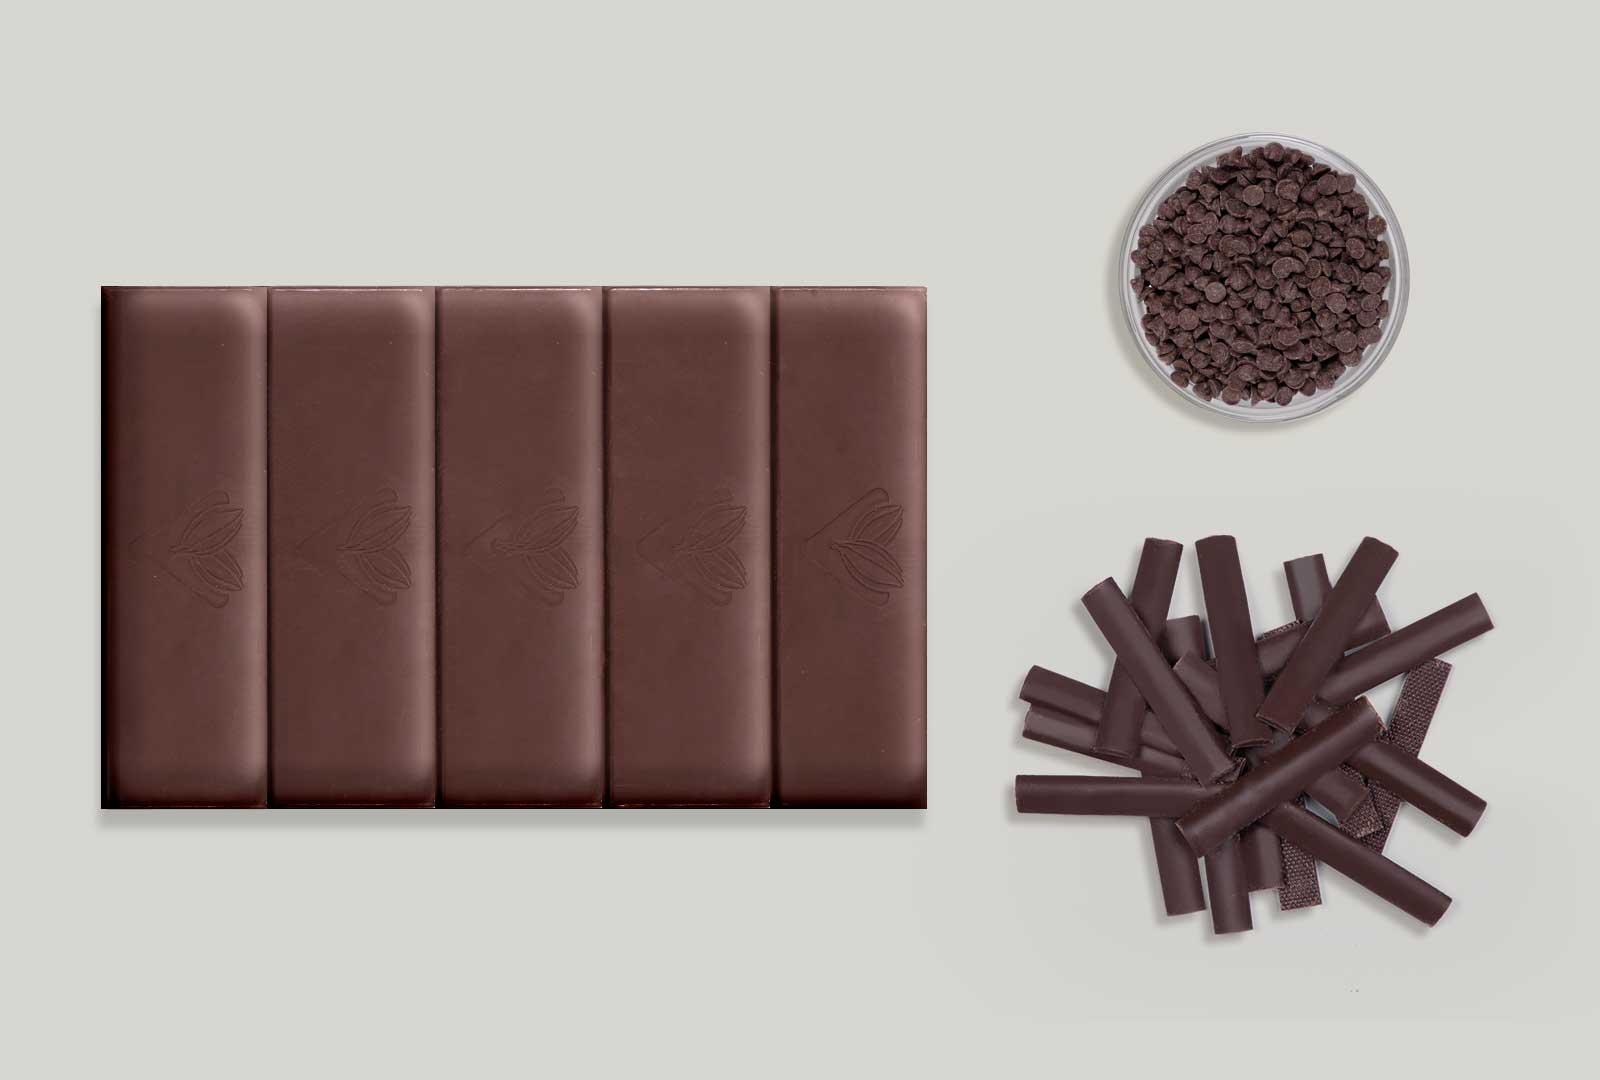 glossy-dark-chocolate-compound-1